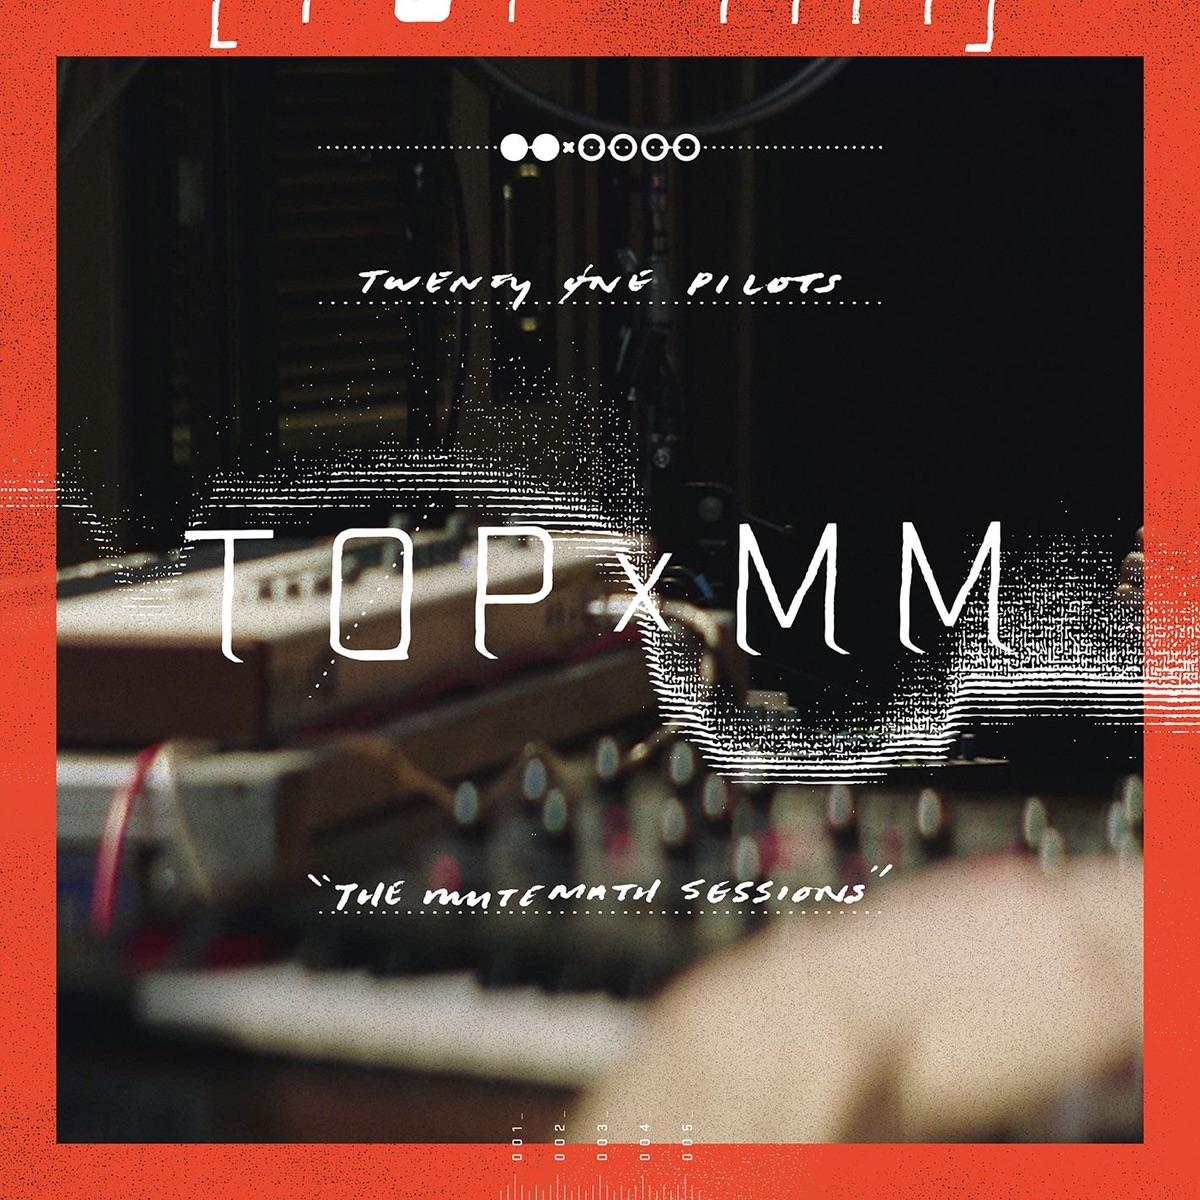 TOPxMM - EP twenty one pilots CD cover